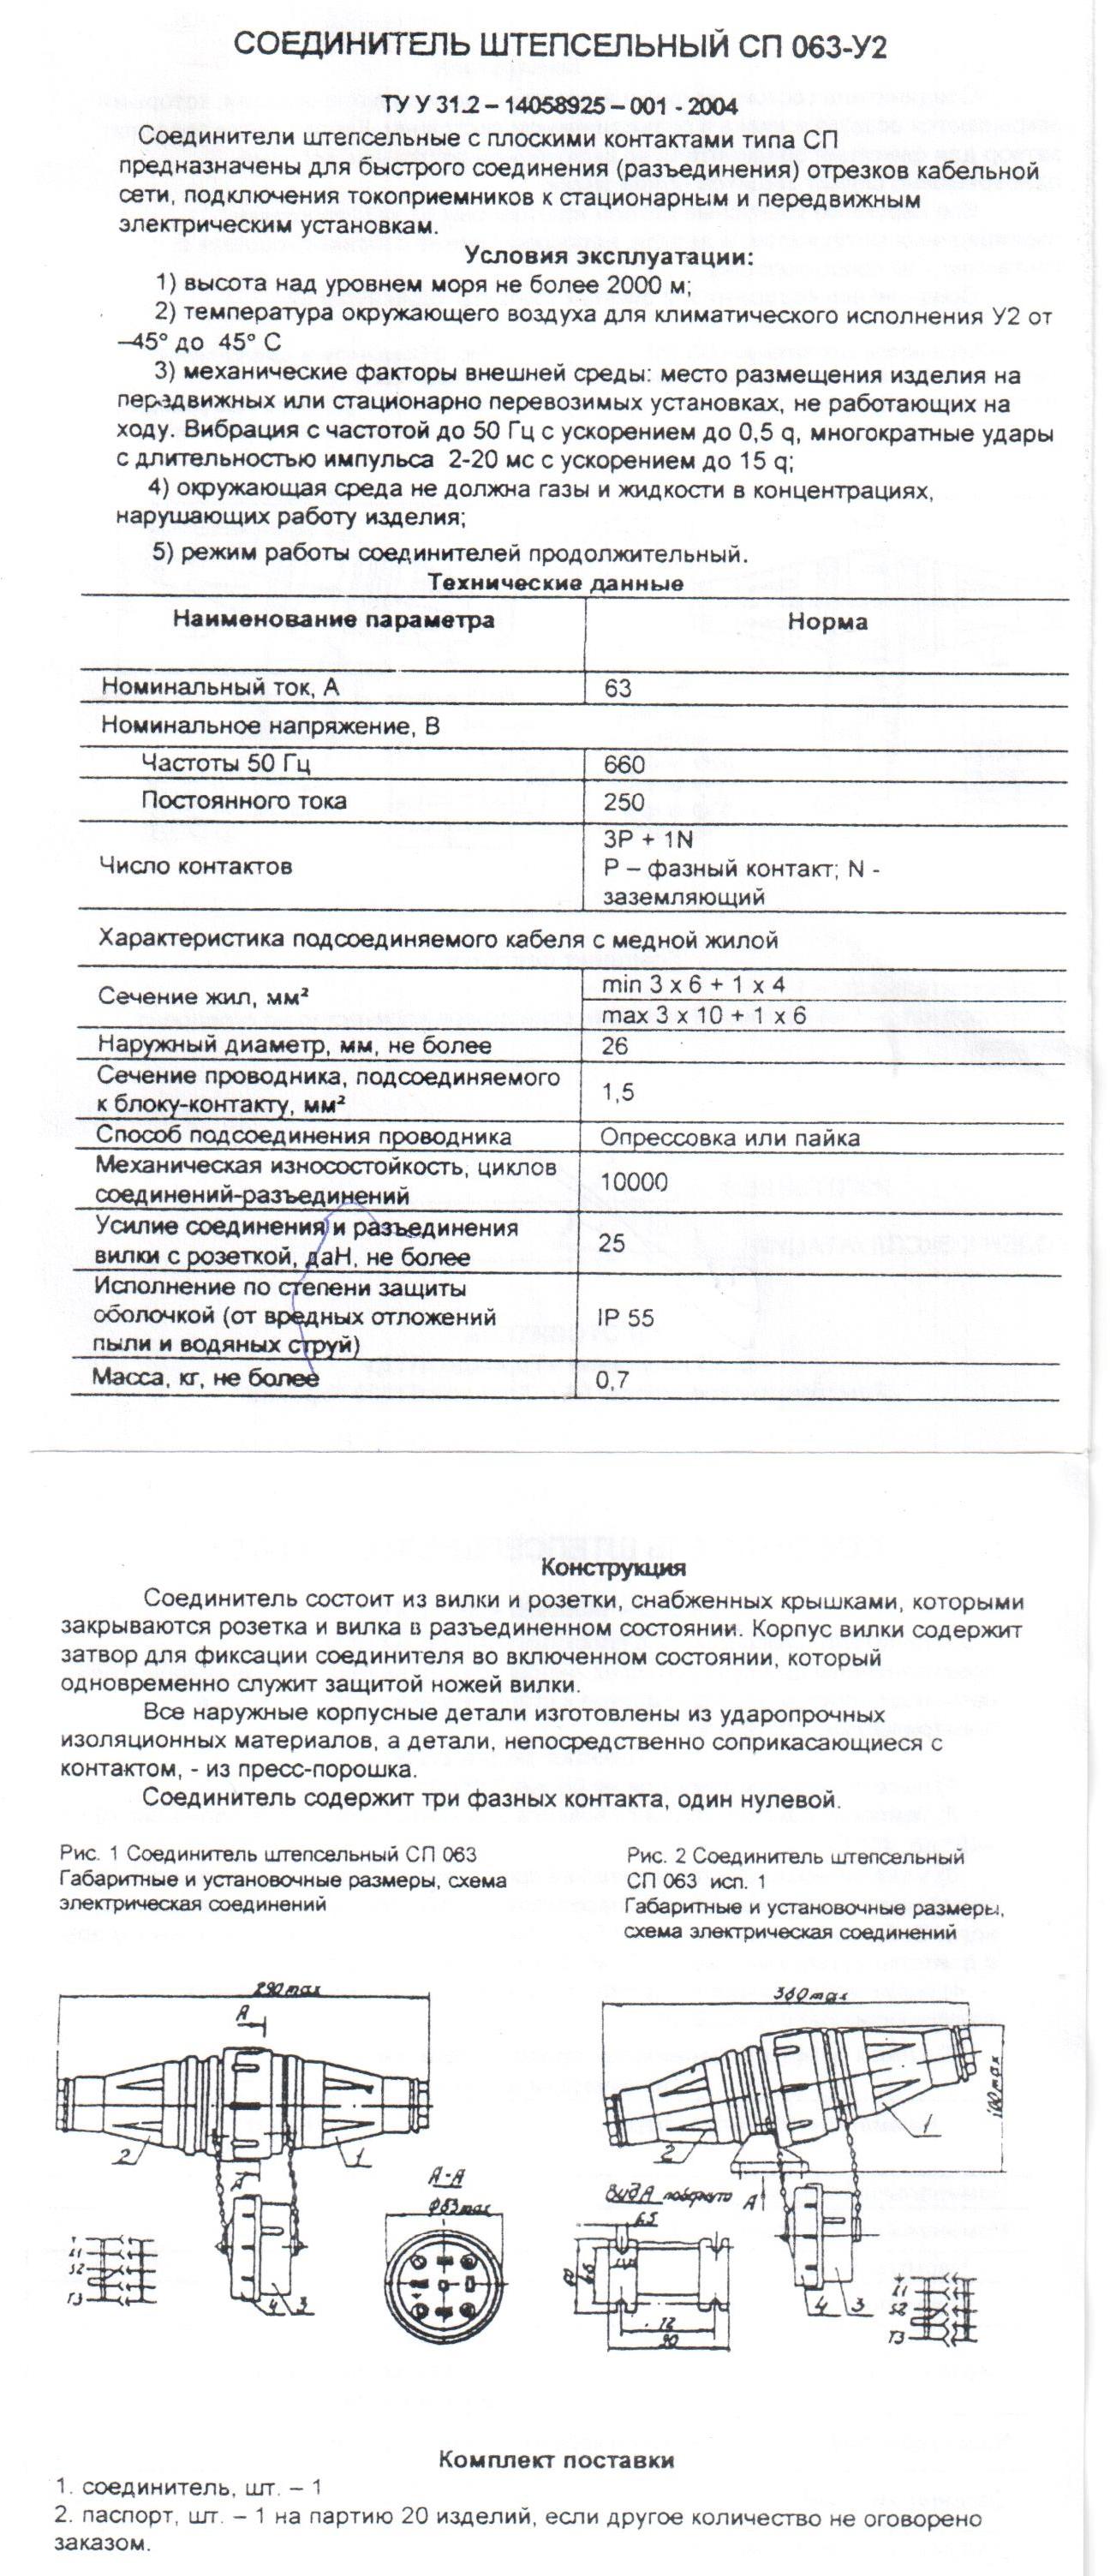 Рулетка р20узг паспорт казино система сектора